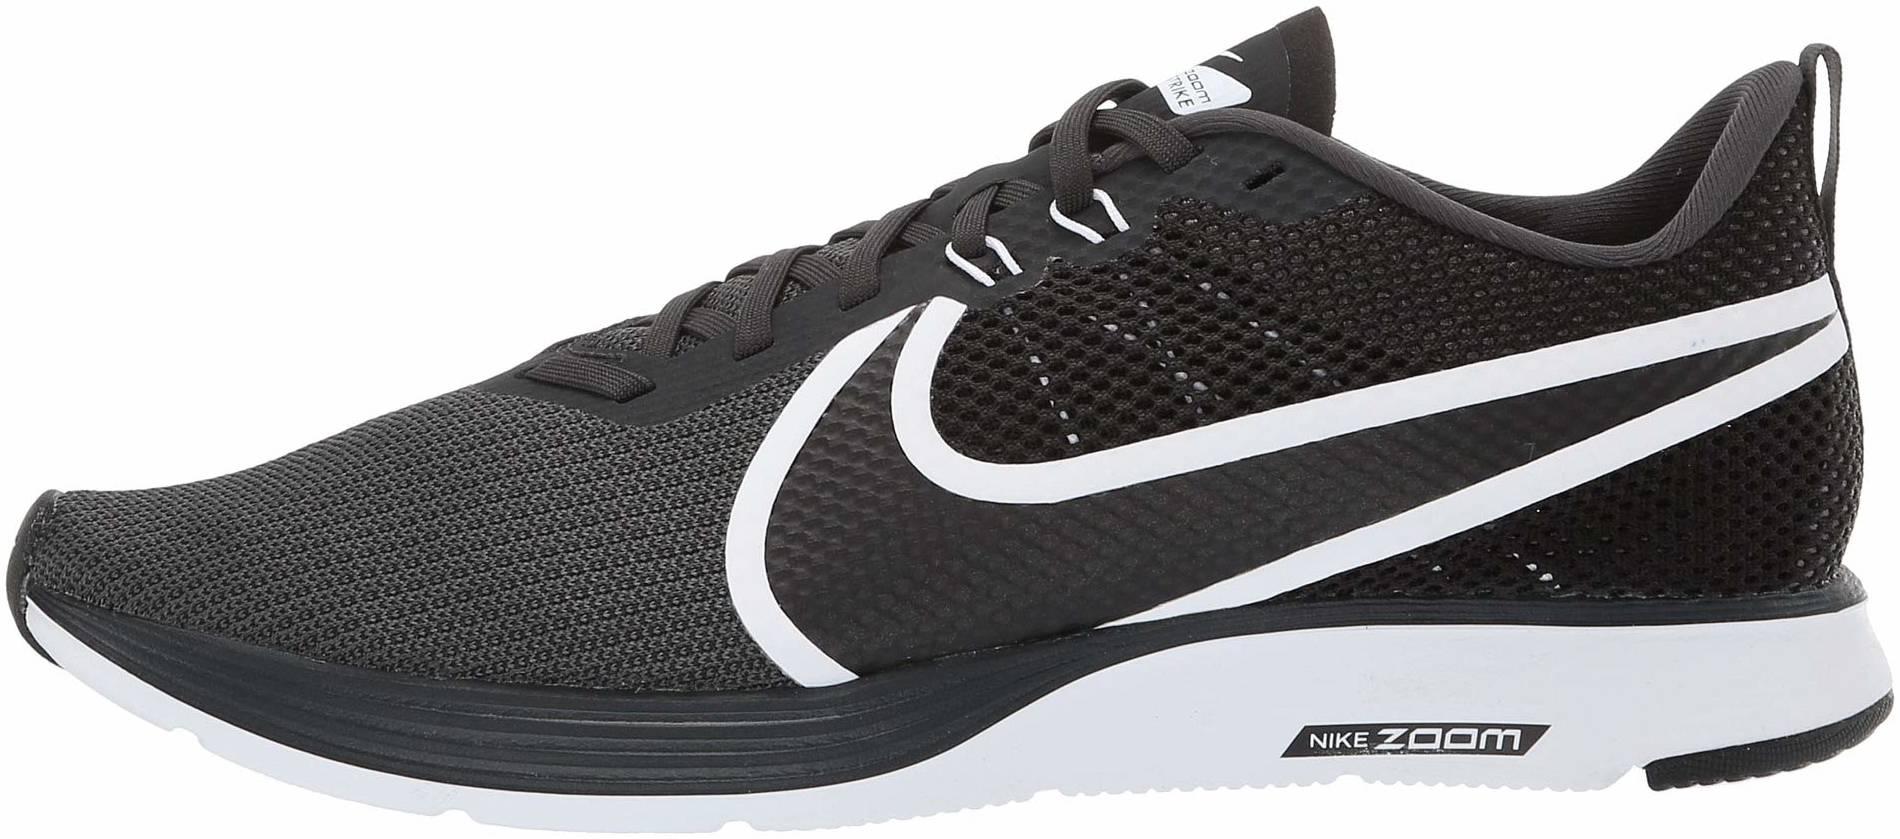 precoz escaramuza Impulso  Only $44 + Review of Nike Zoom Strike 2 | RunRepeat